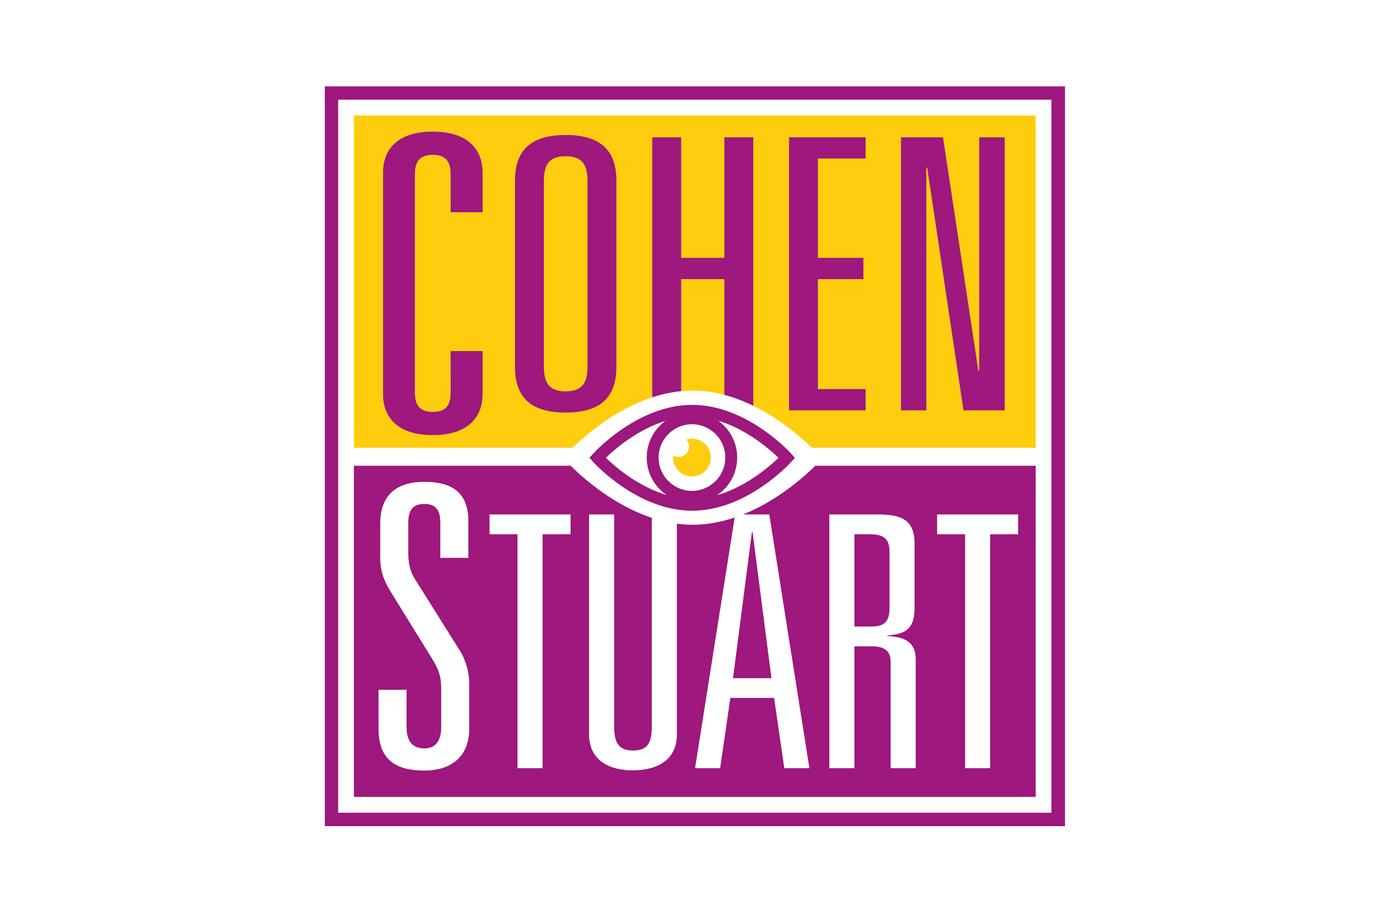 Logo_Cohen_Stuart